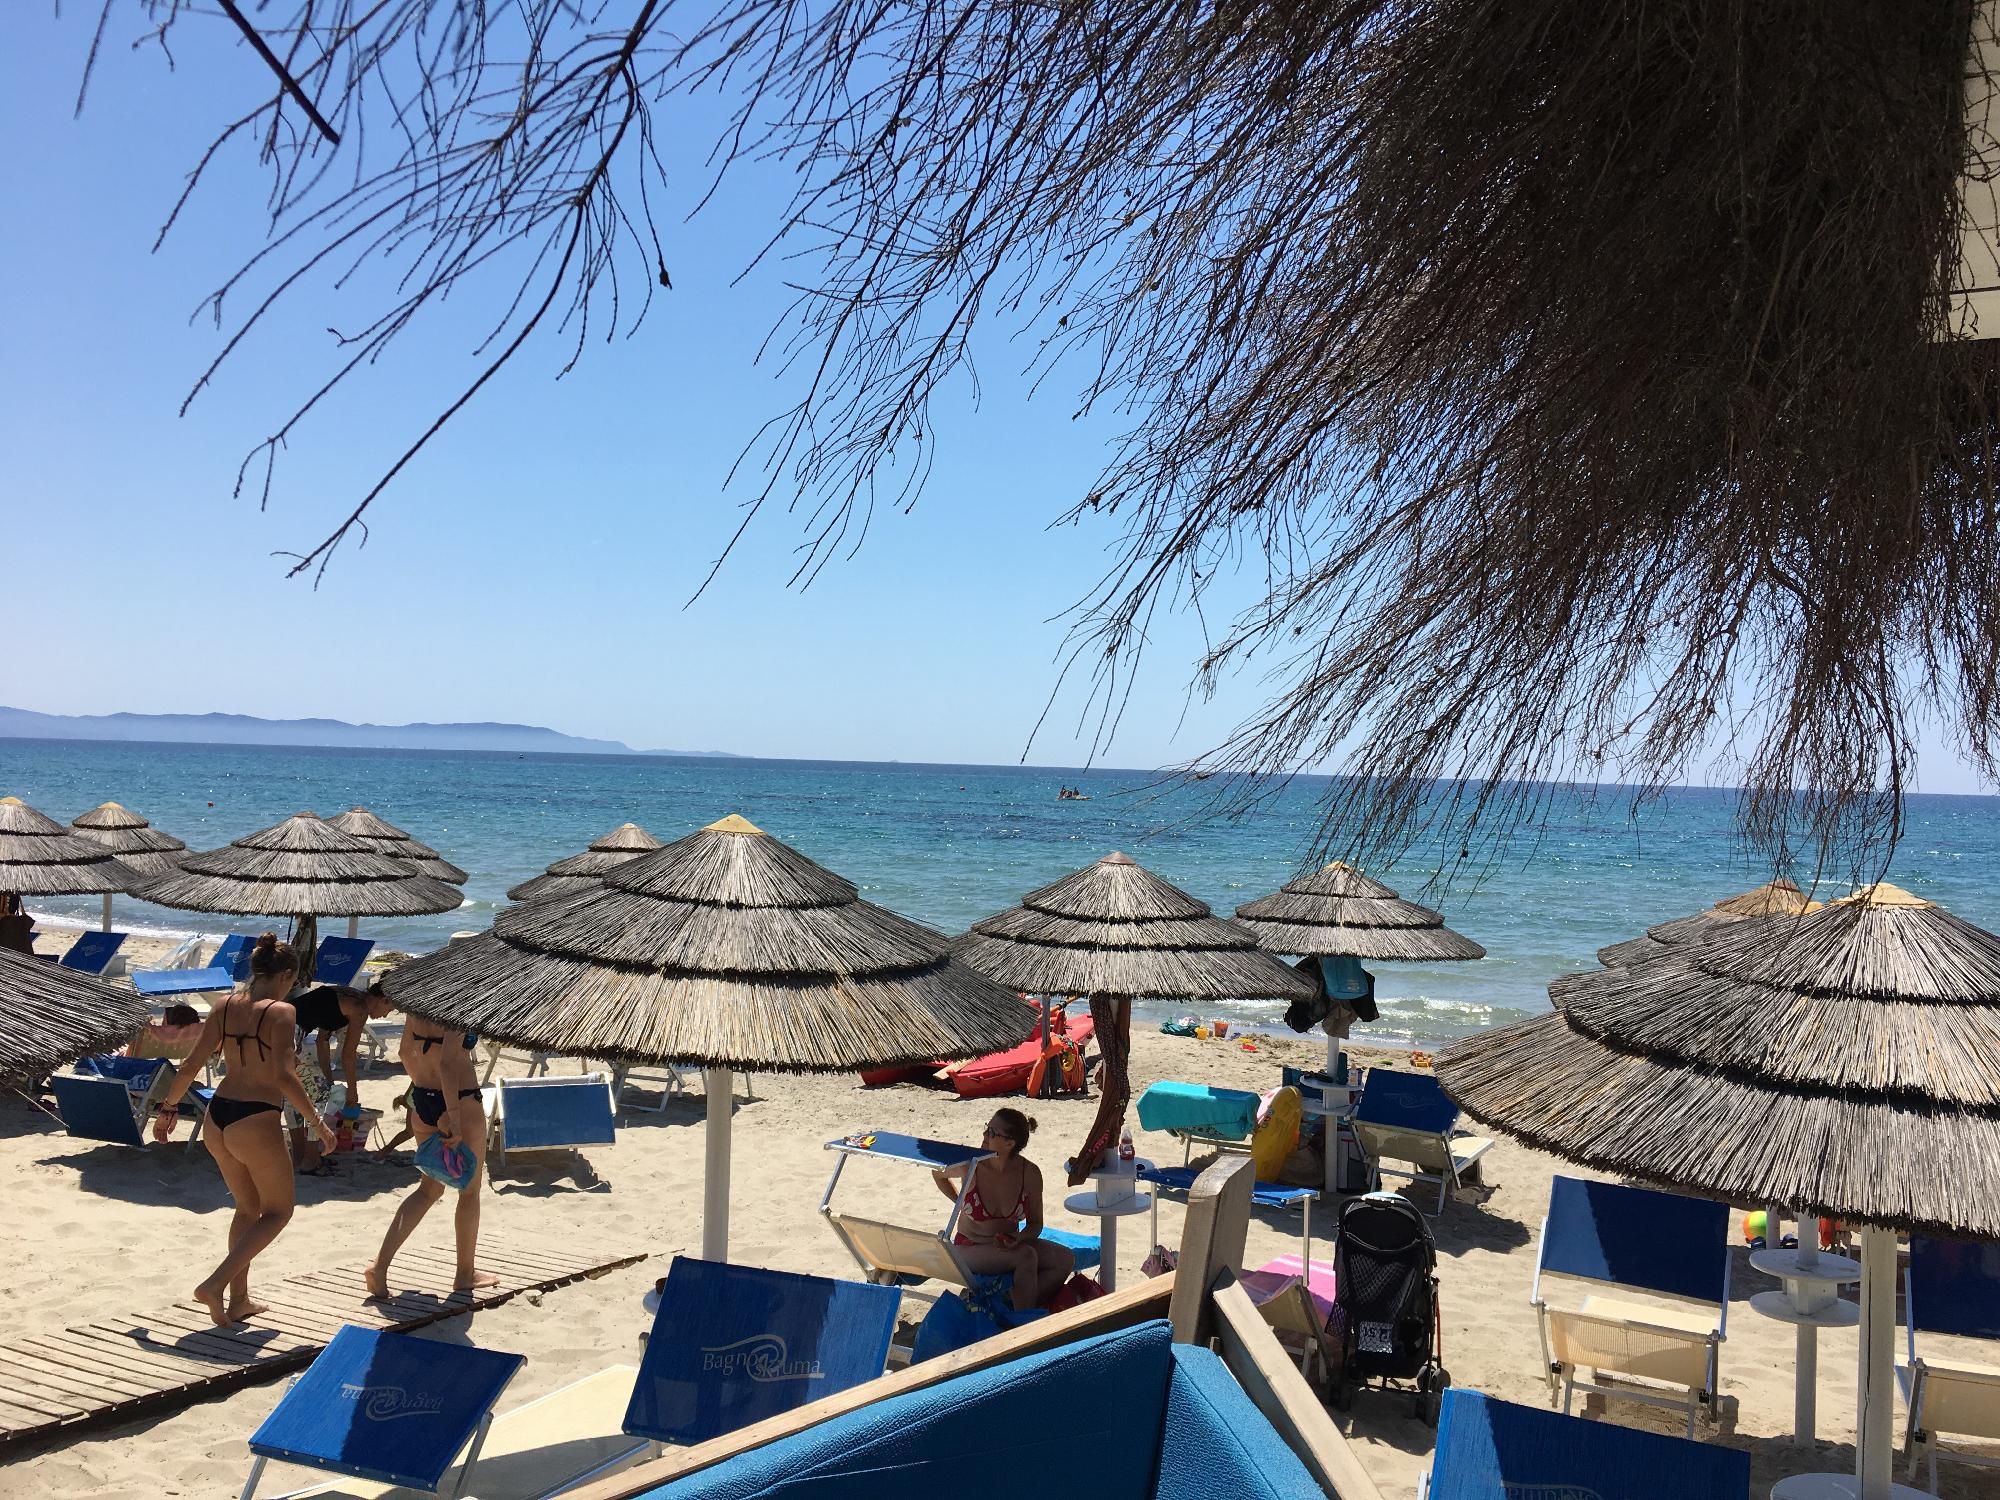 La Baracchina Bagnoskiuma Beach